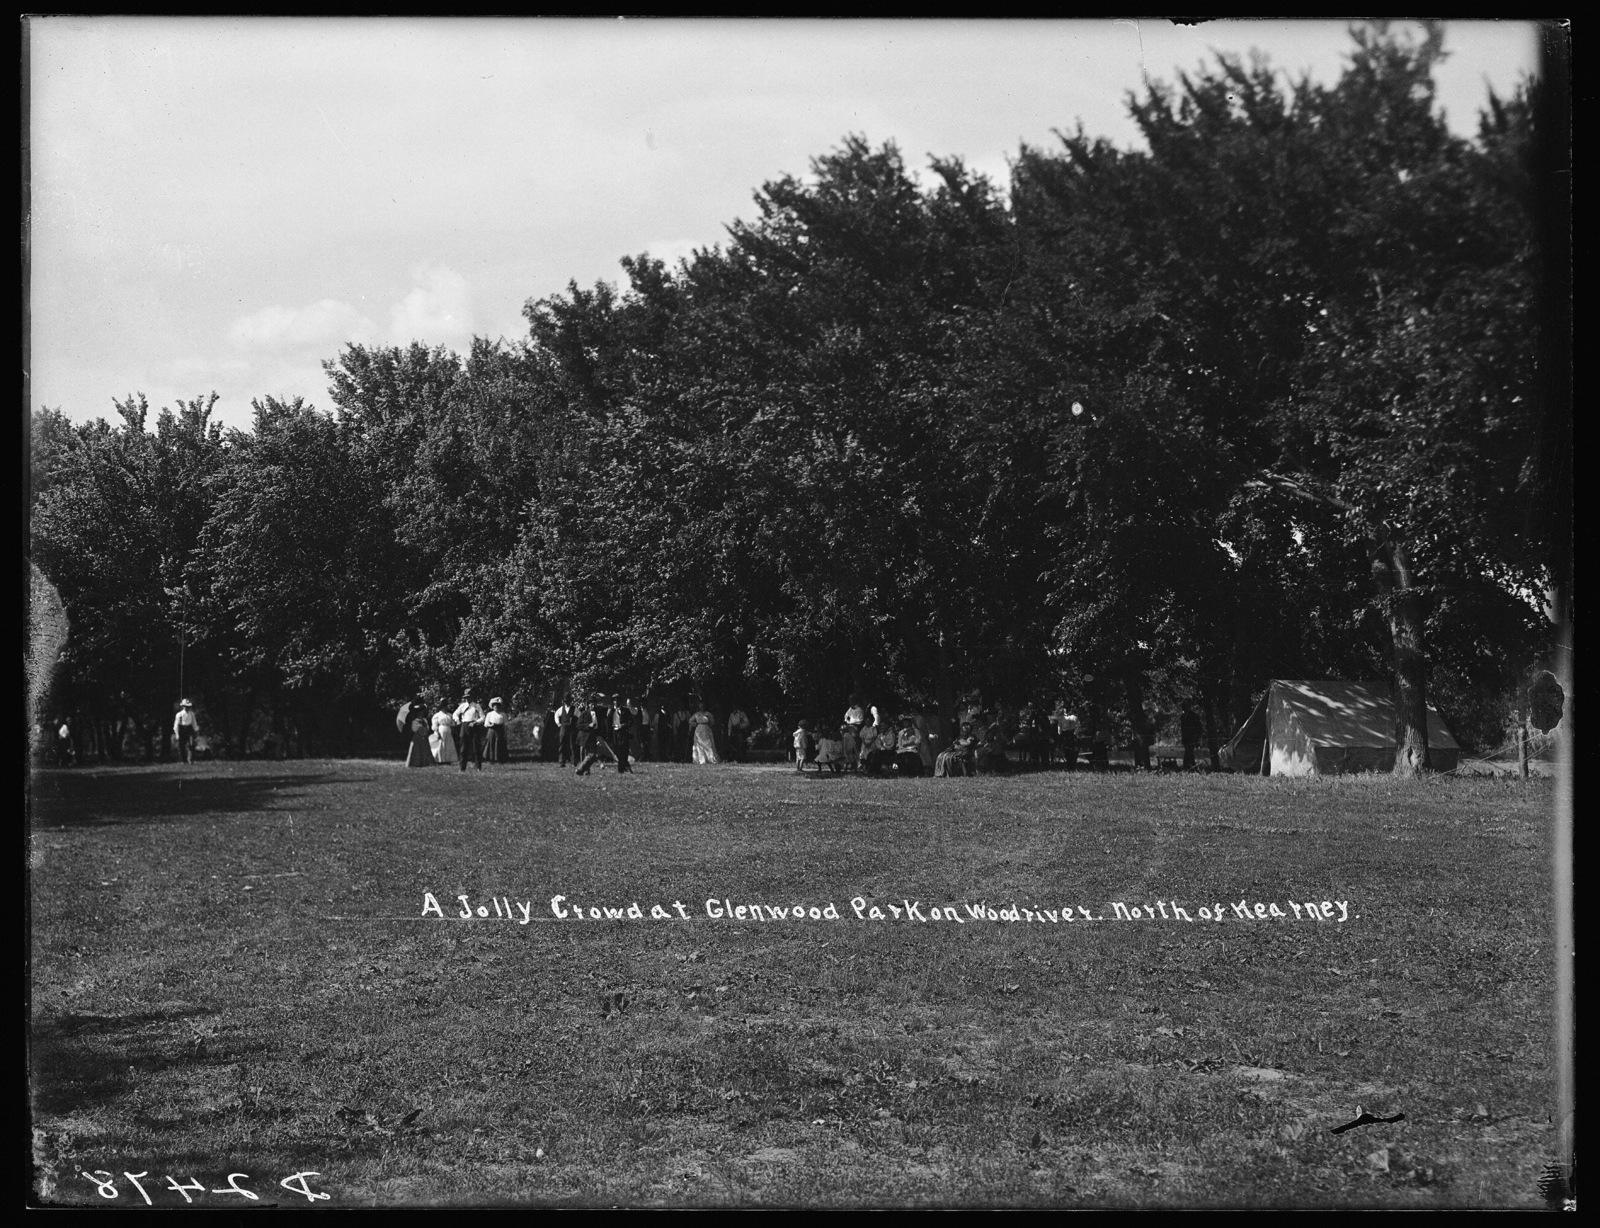 A jolly crowd at Glenwood Park on the Wood River, north of Kearney, Nebraska.